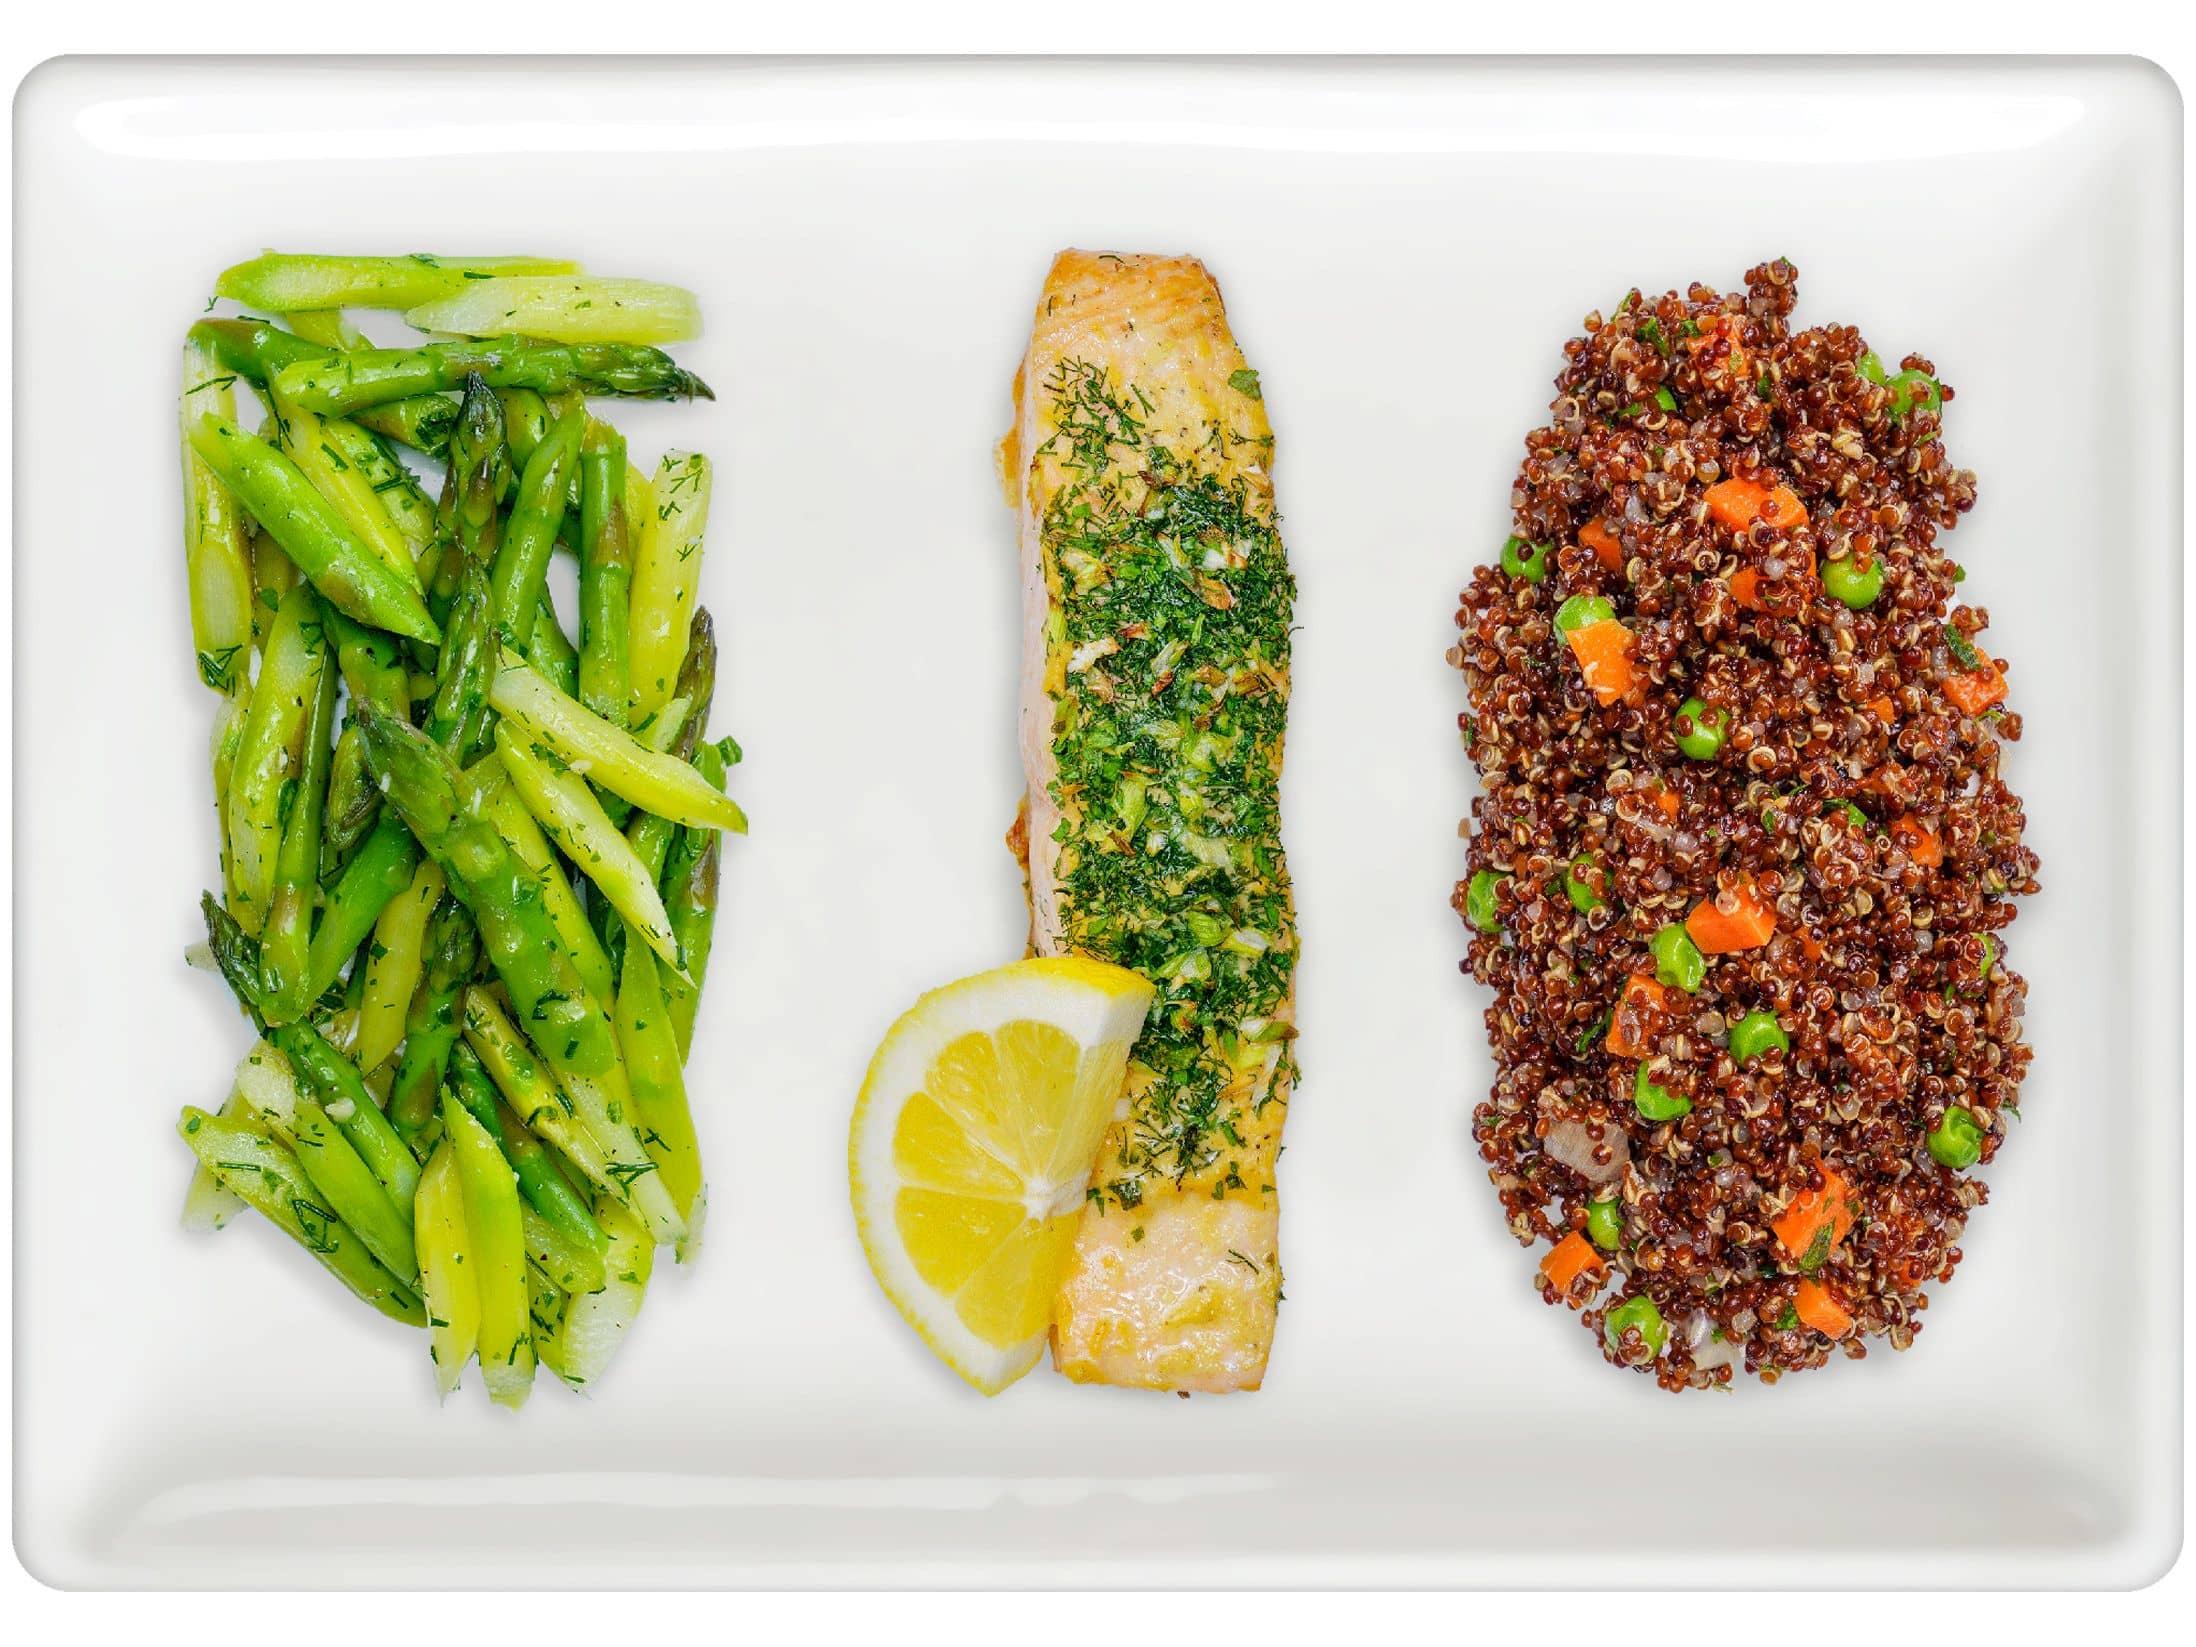 Asparagus, Herb-Roasted Salmon, Quinoa Pilaf